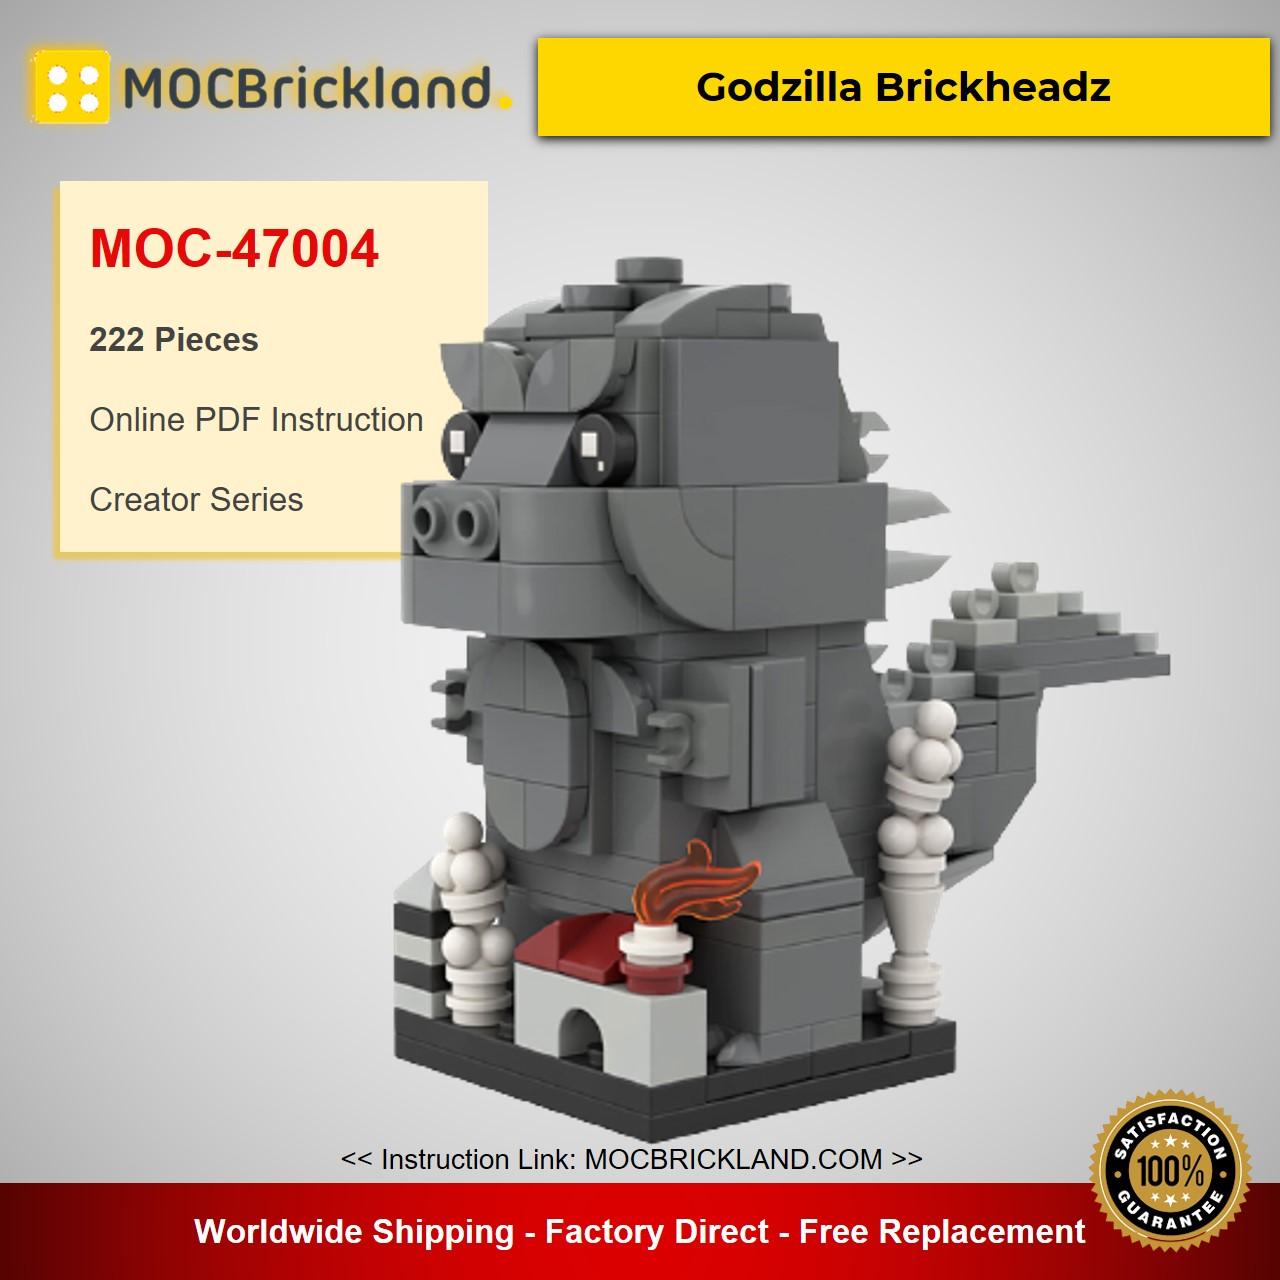 Godzilla Brickheadz MOC-47004 Creator Designed By Brickdroid With 222 Pieces